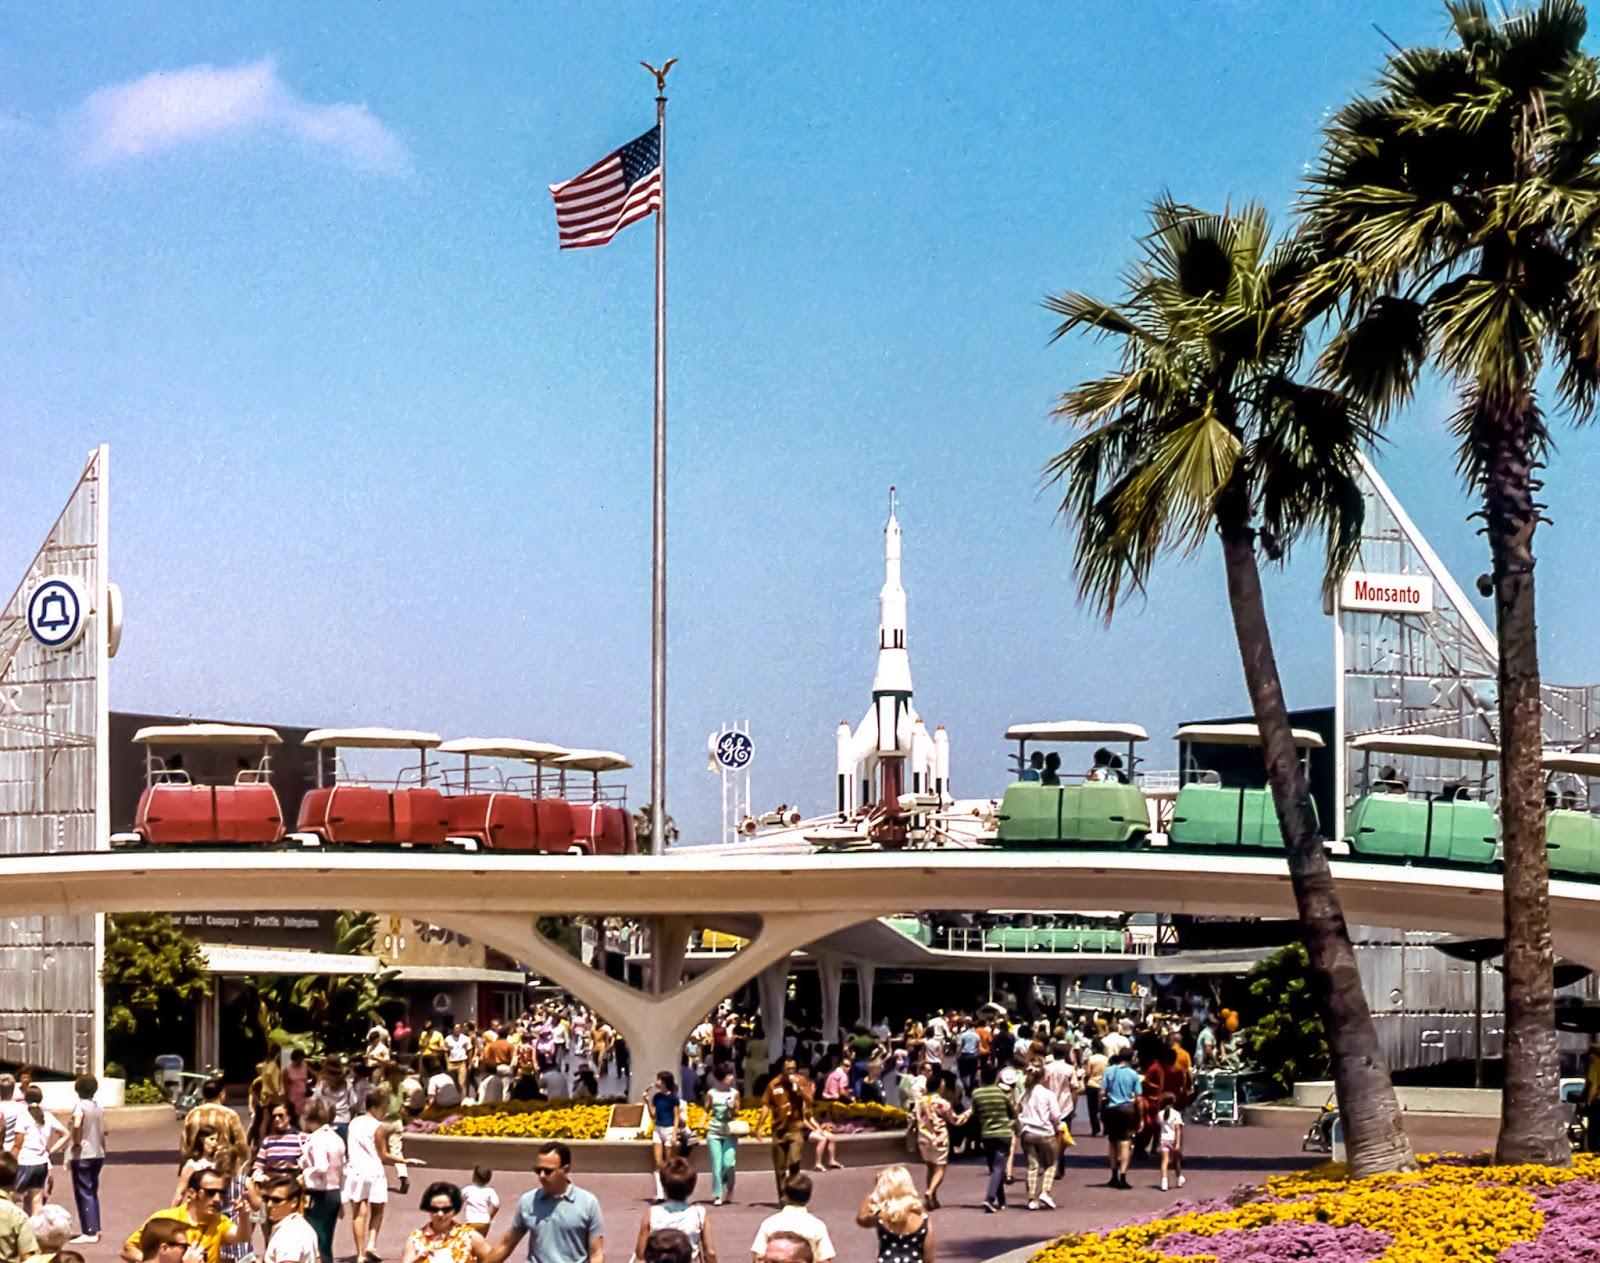 Mickeyphotos Disneyland S Tomorrowland With The